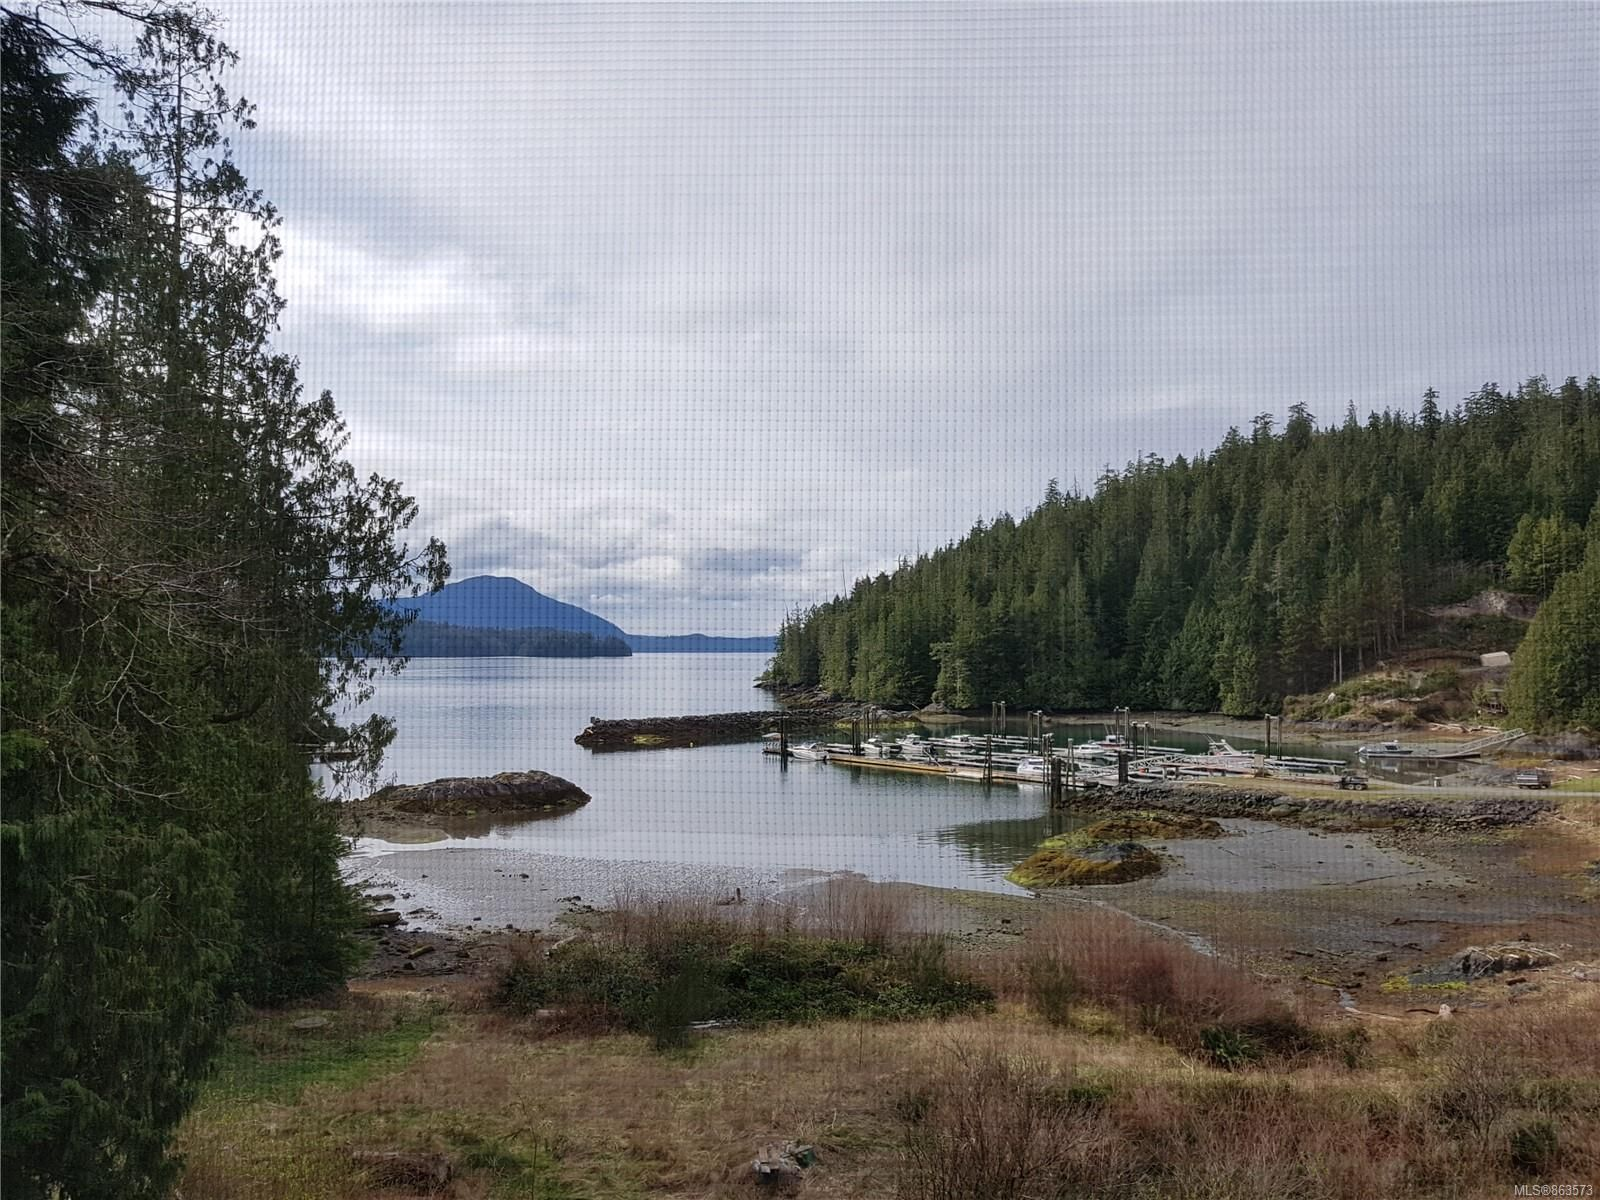 Main Photo: 33 Haggard Cove in : PA Alberni Inlet Land for sale (Port Alberni)  : MLS®# 863573